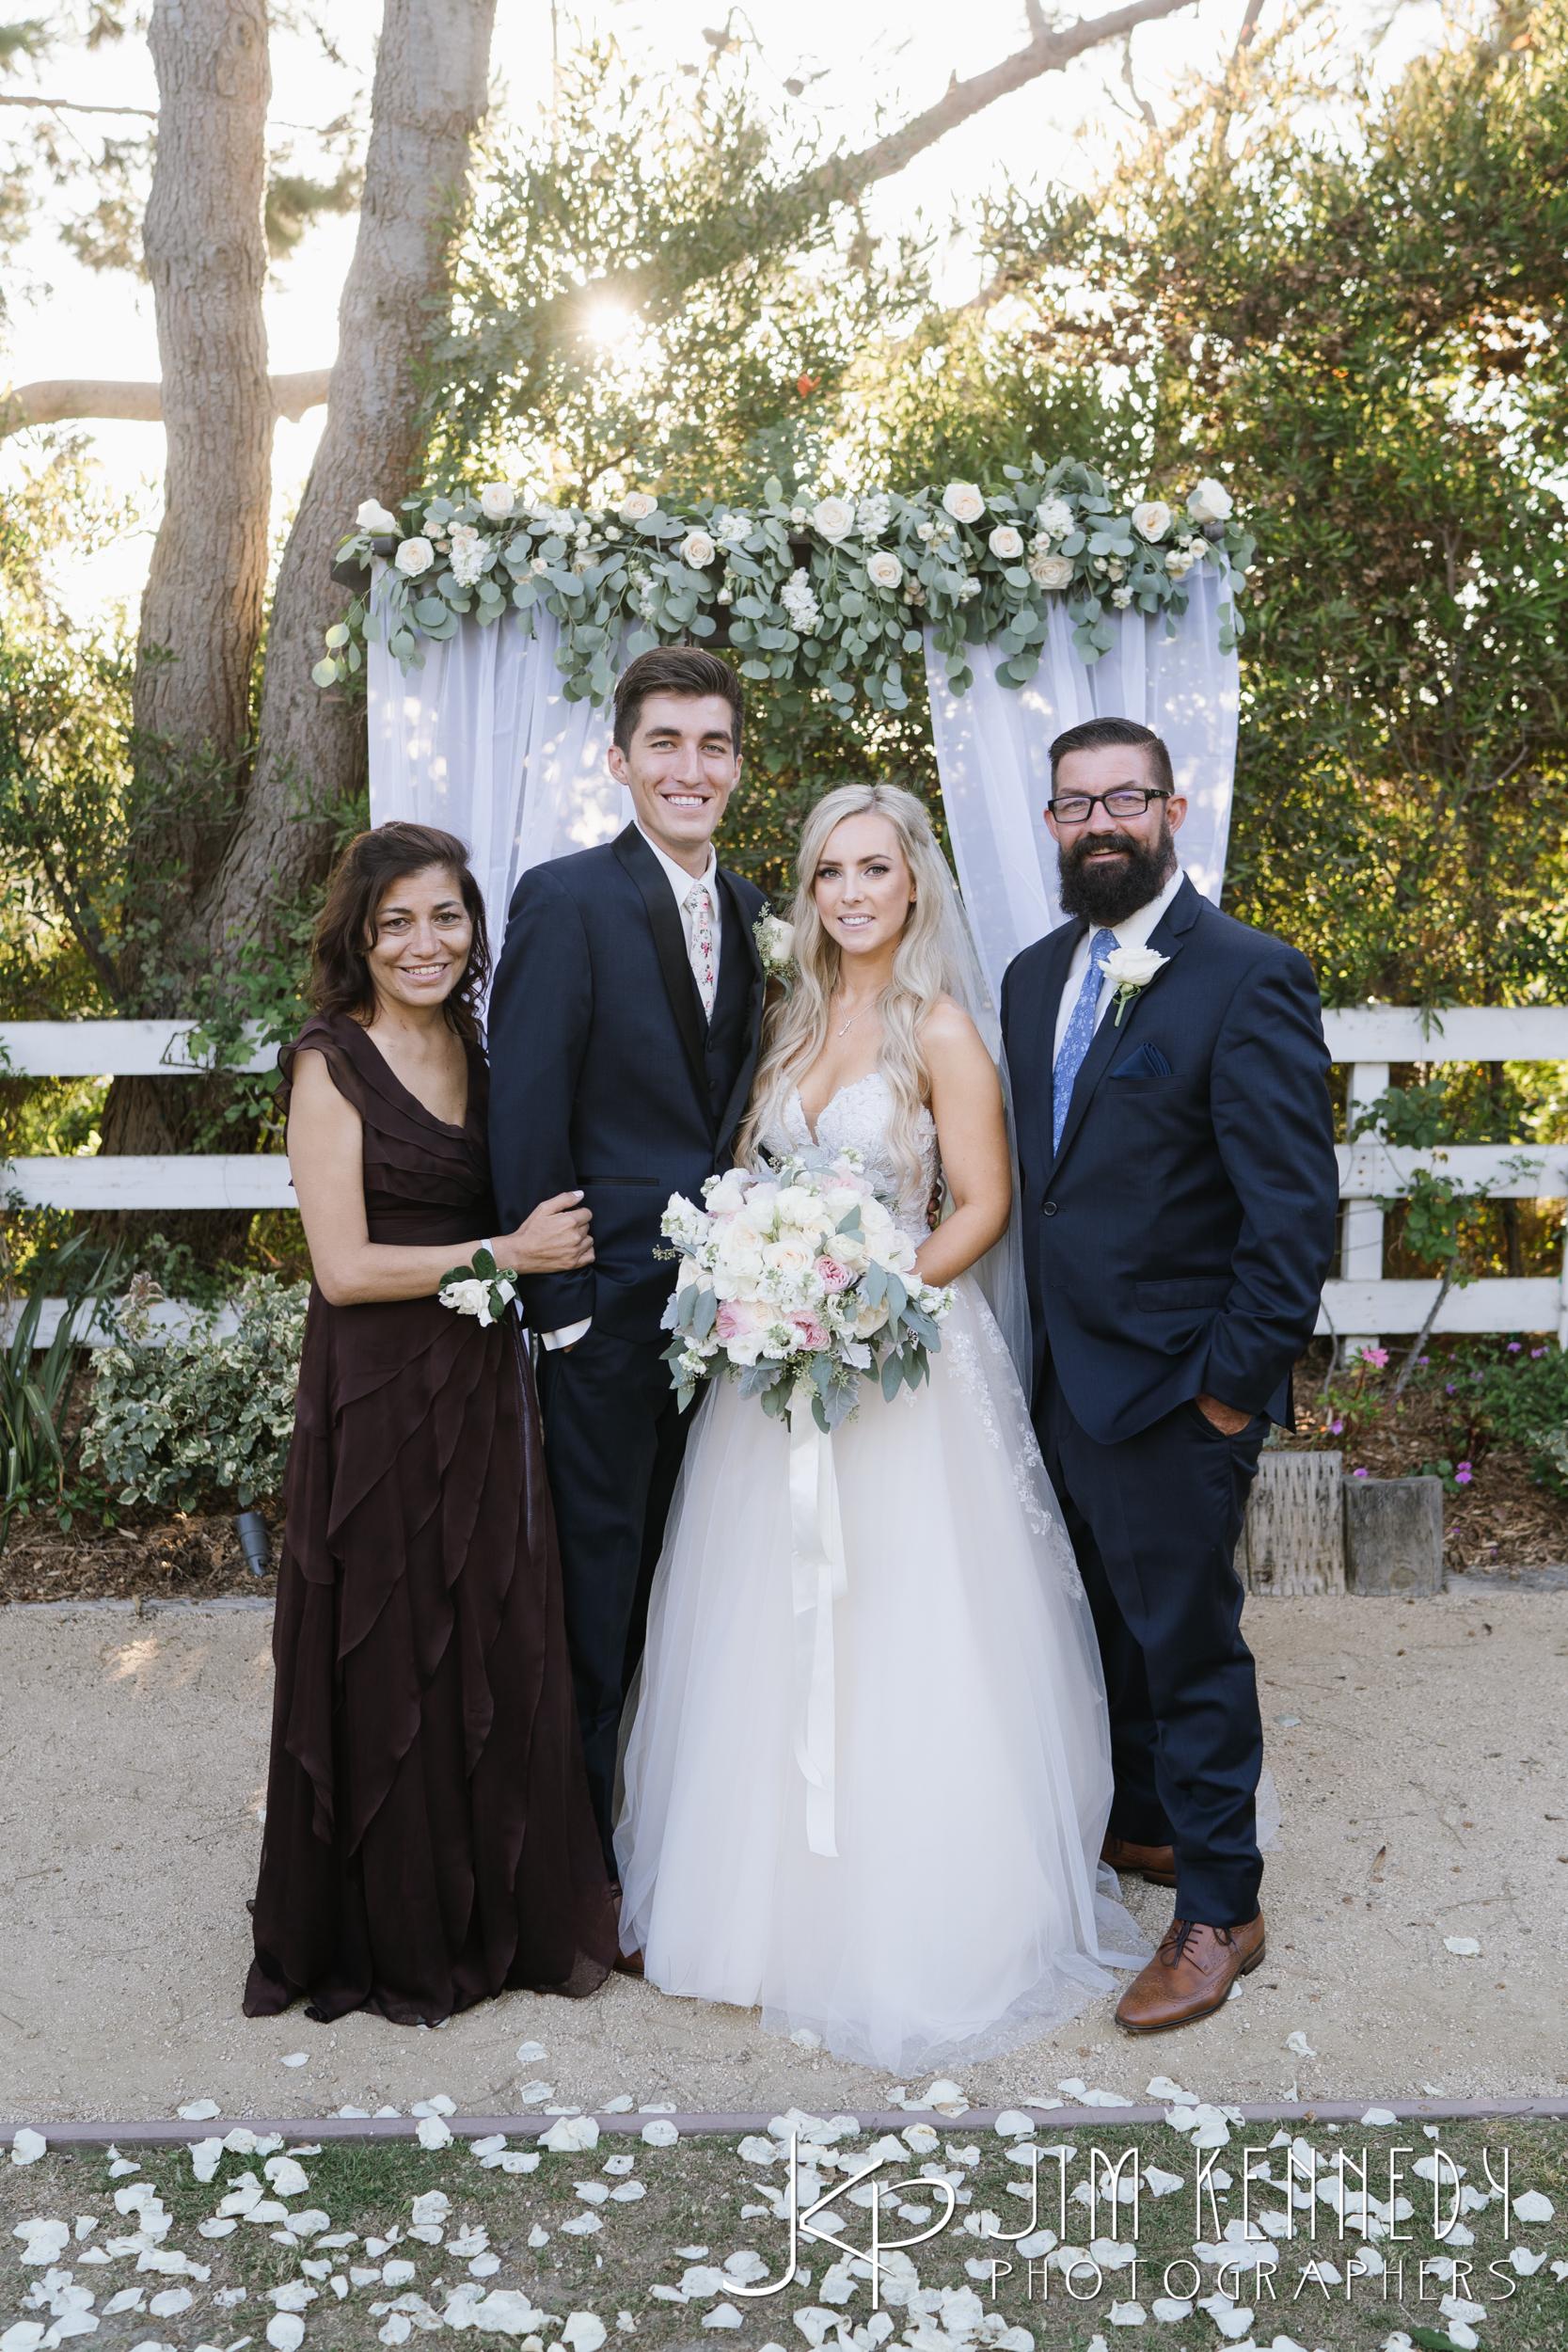 huntington_beach_wedding-3901.jpg